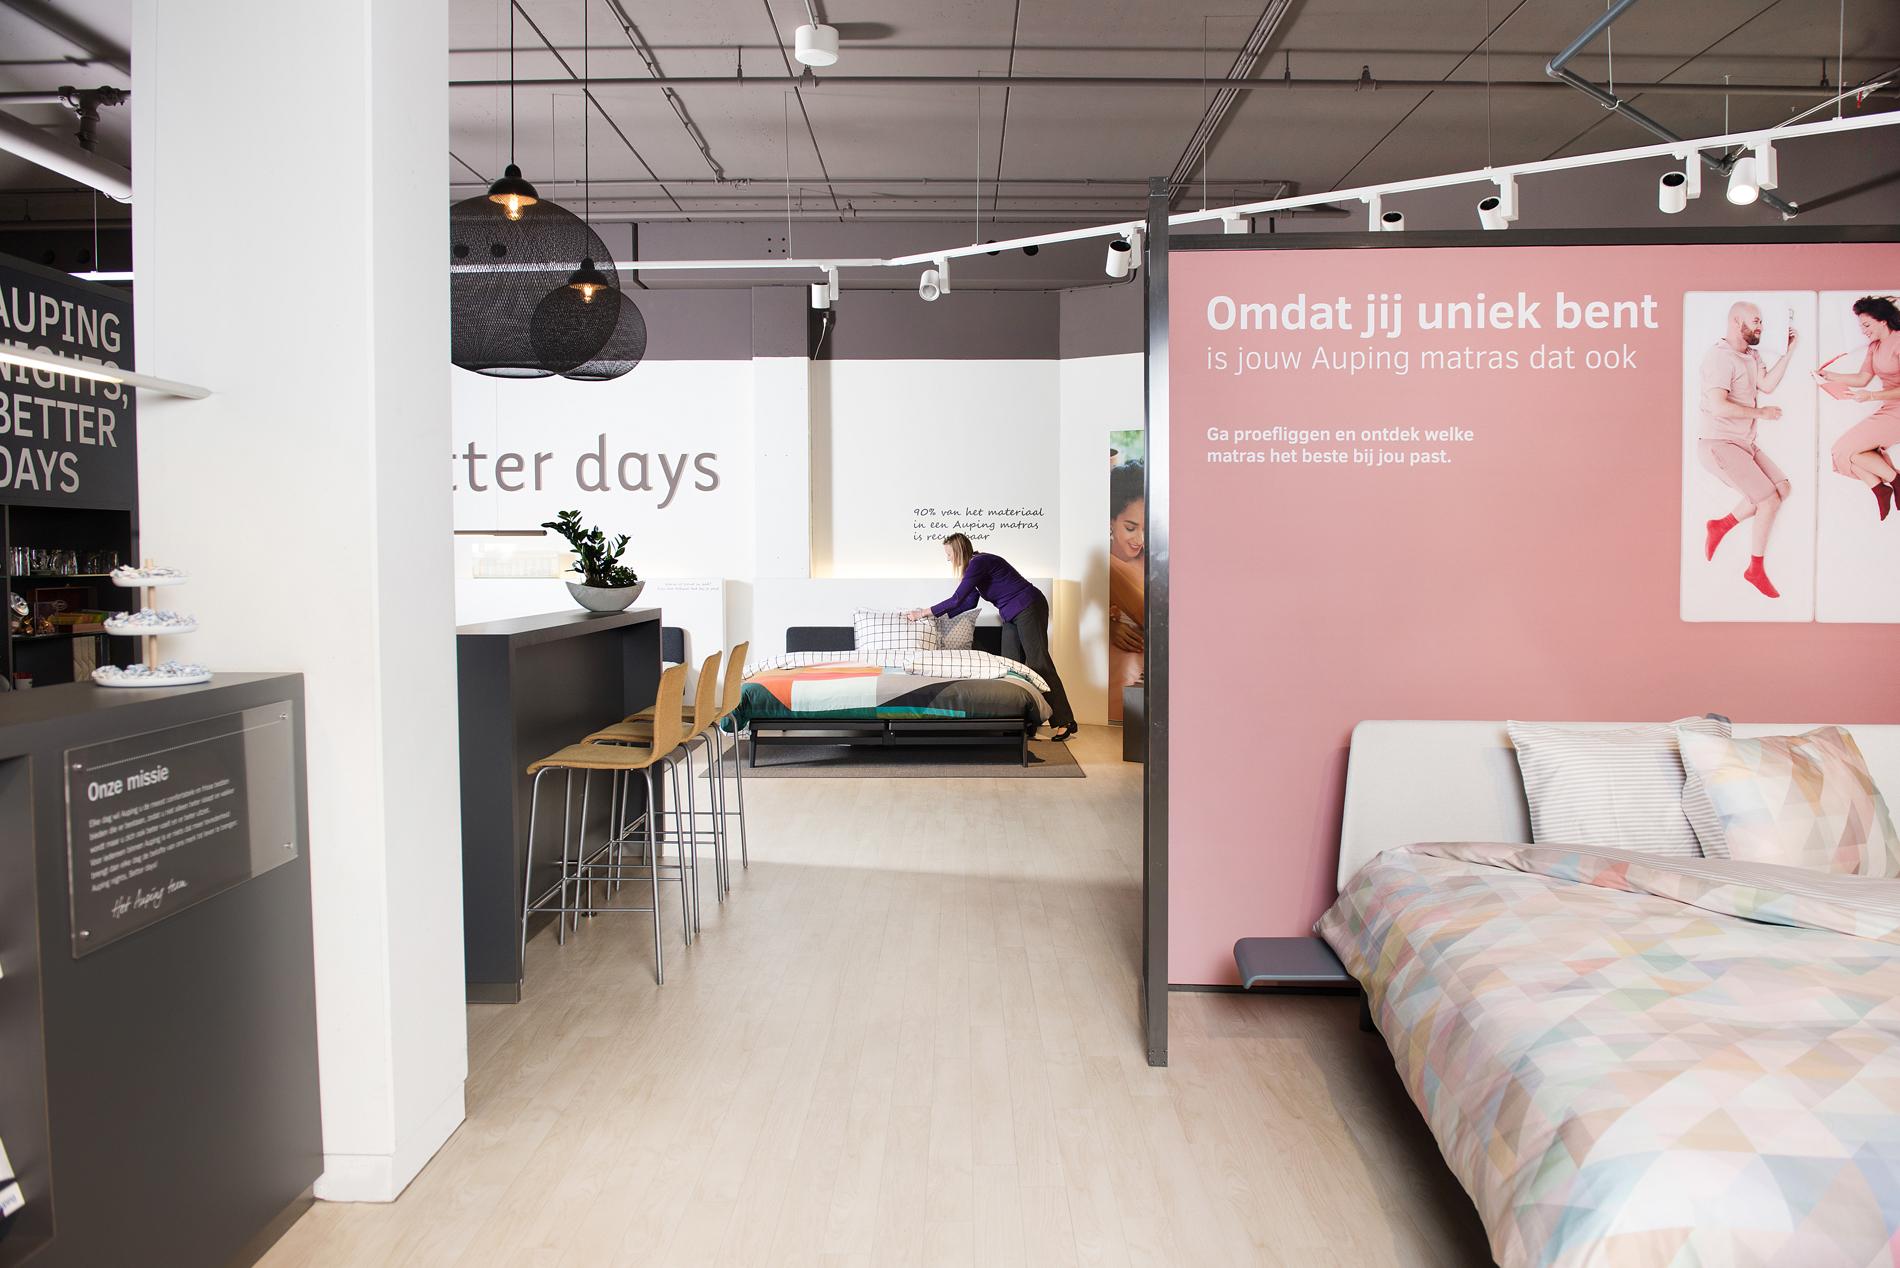 Auping Plaza Den Haag Megastores – Natural Vita Talalay Latex Mattress Store in Den Haag Megastores South Holland